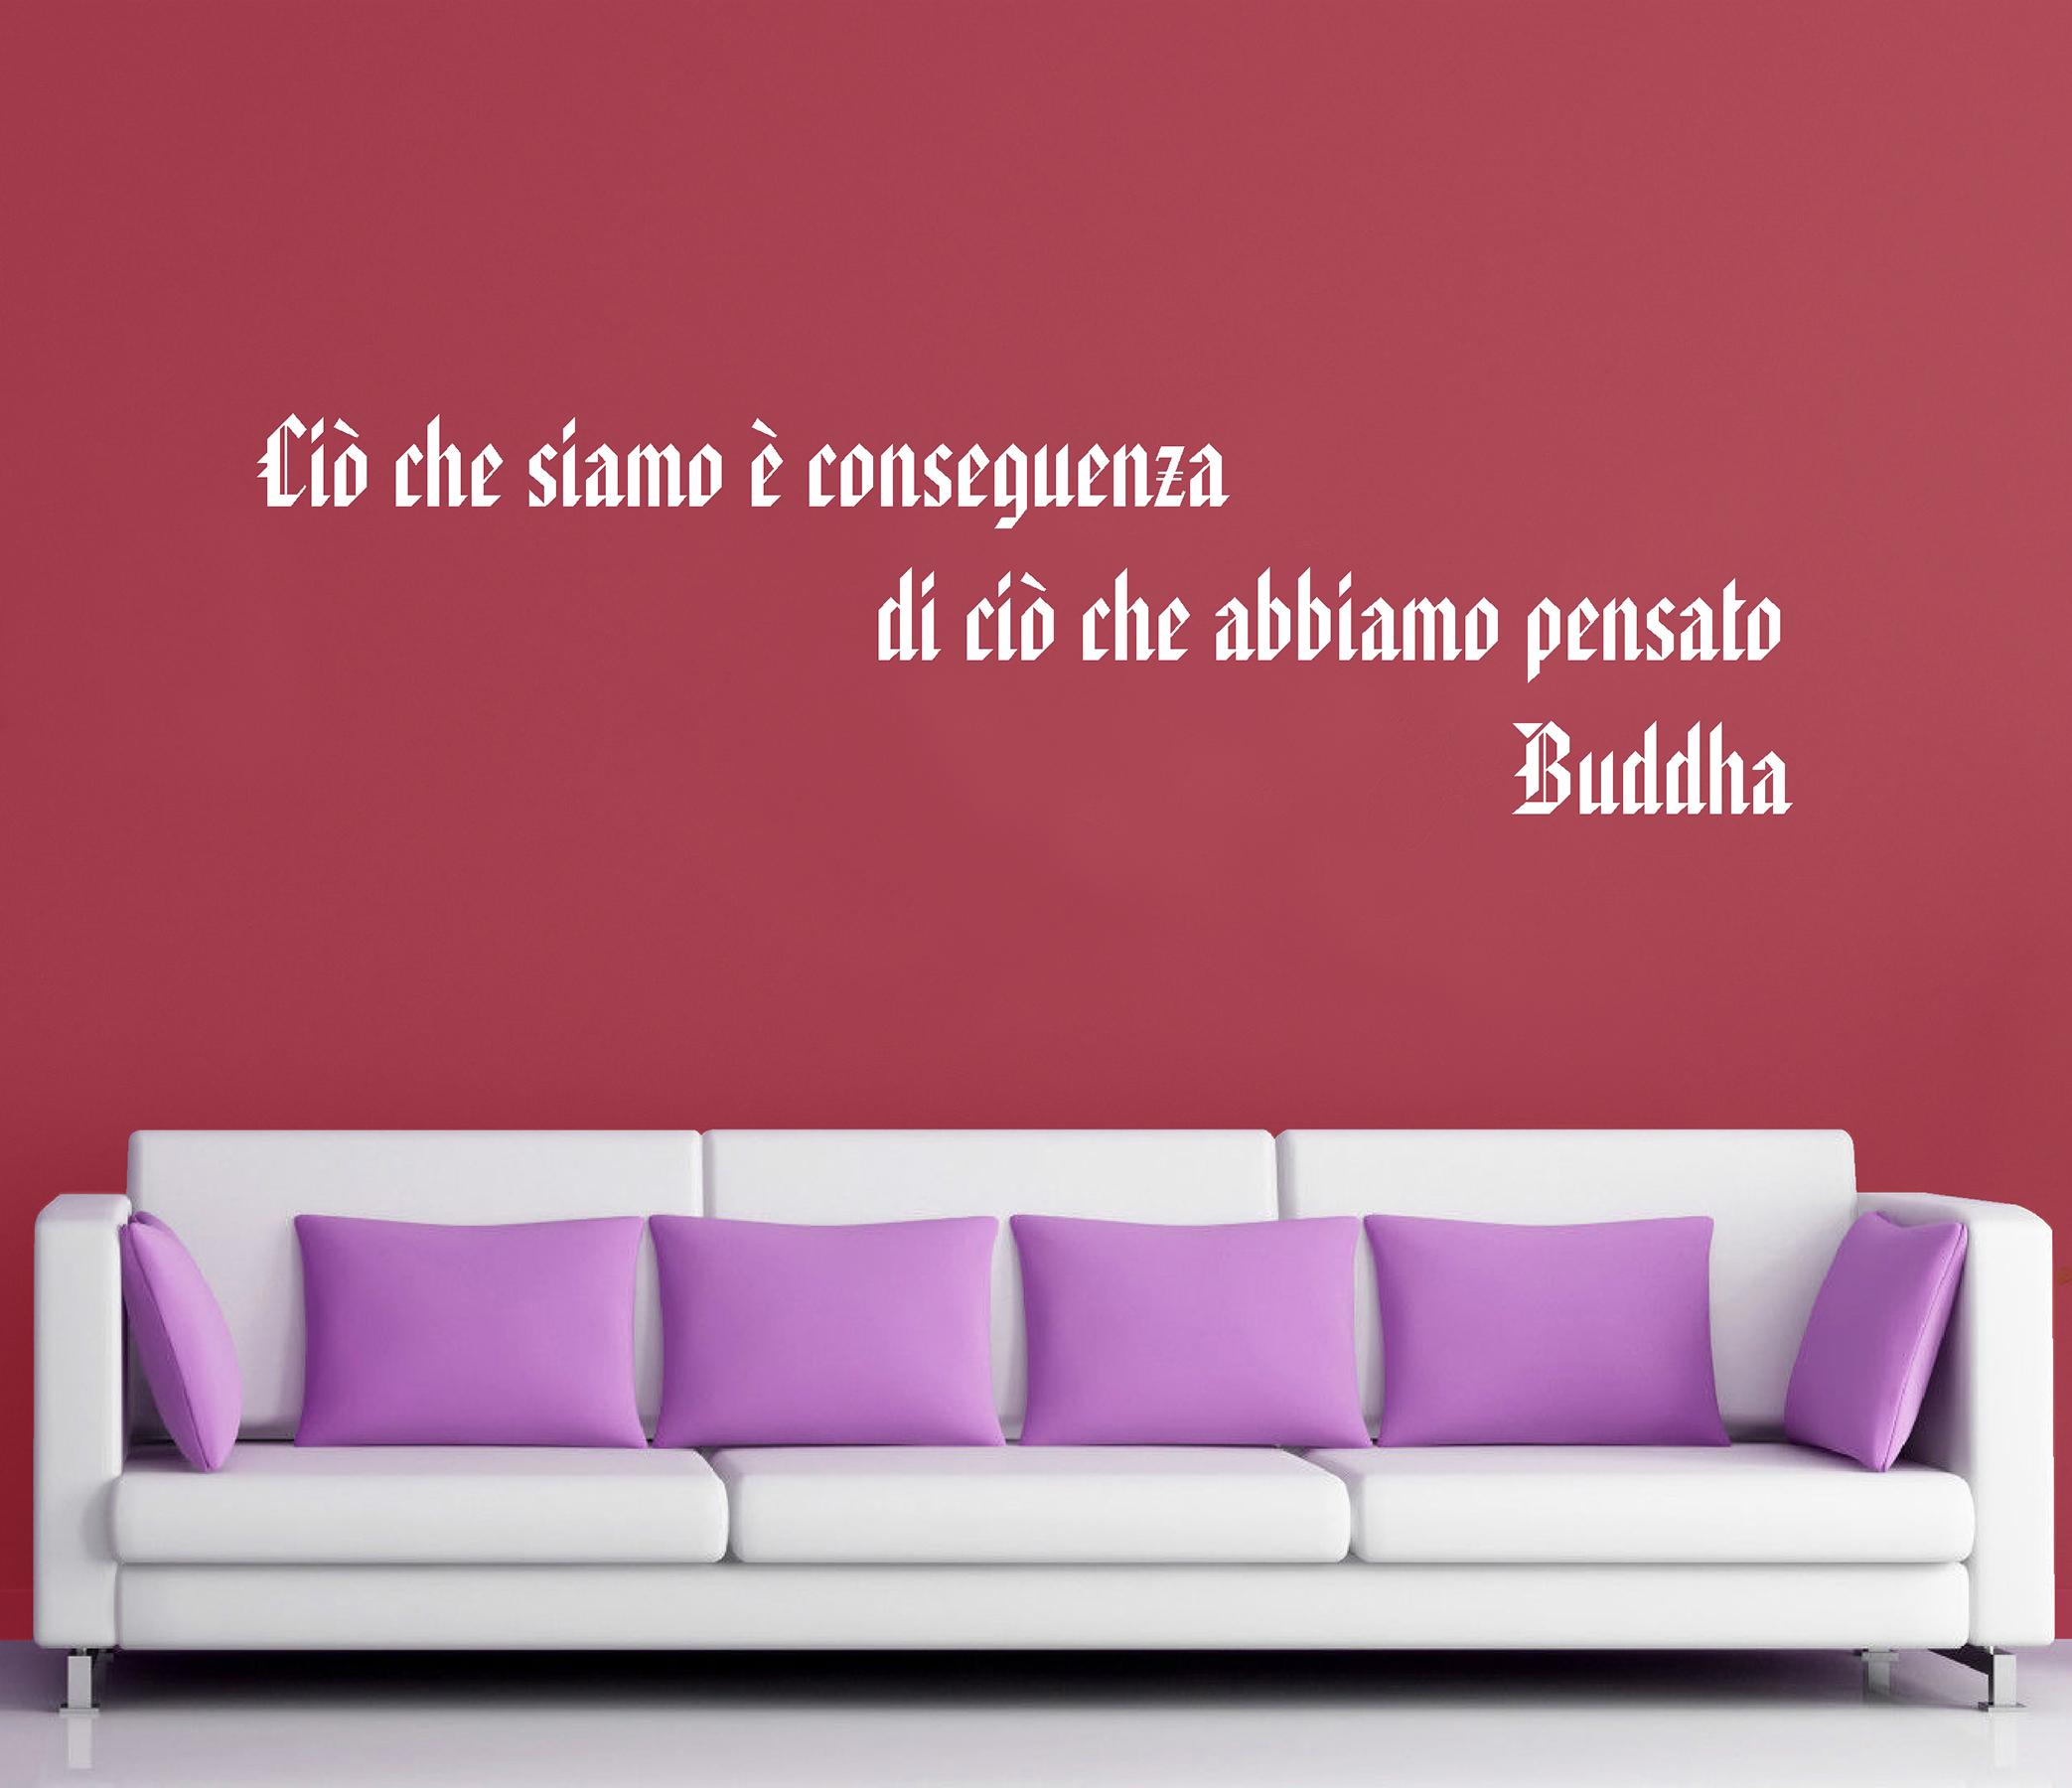 Wall stickers adesivi murali buddha aforismi frasi - Frasi spinte da dire a letto ...